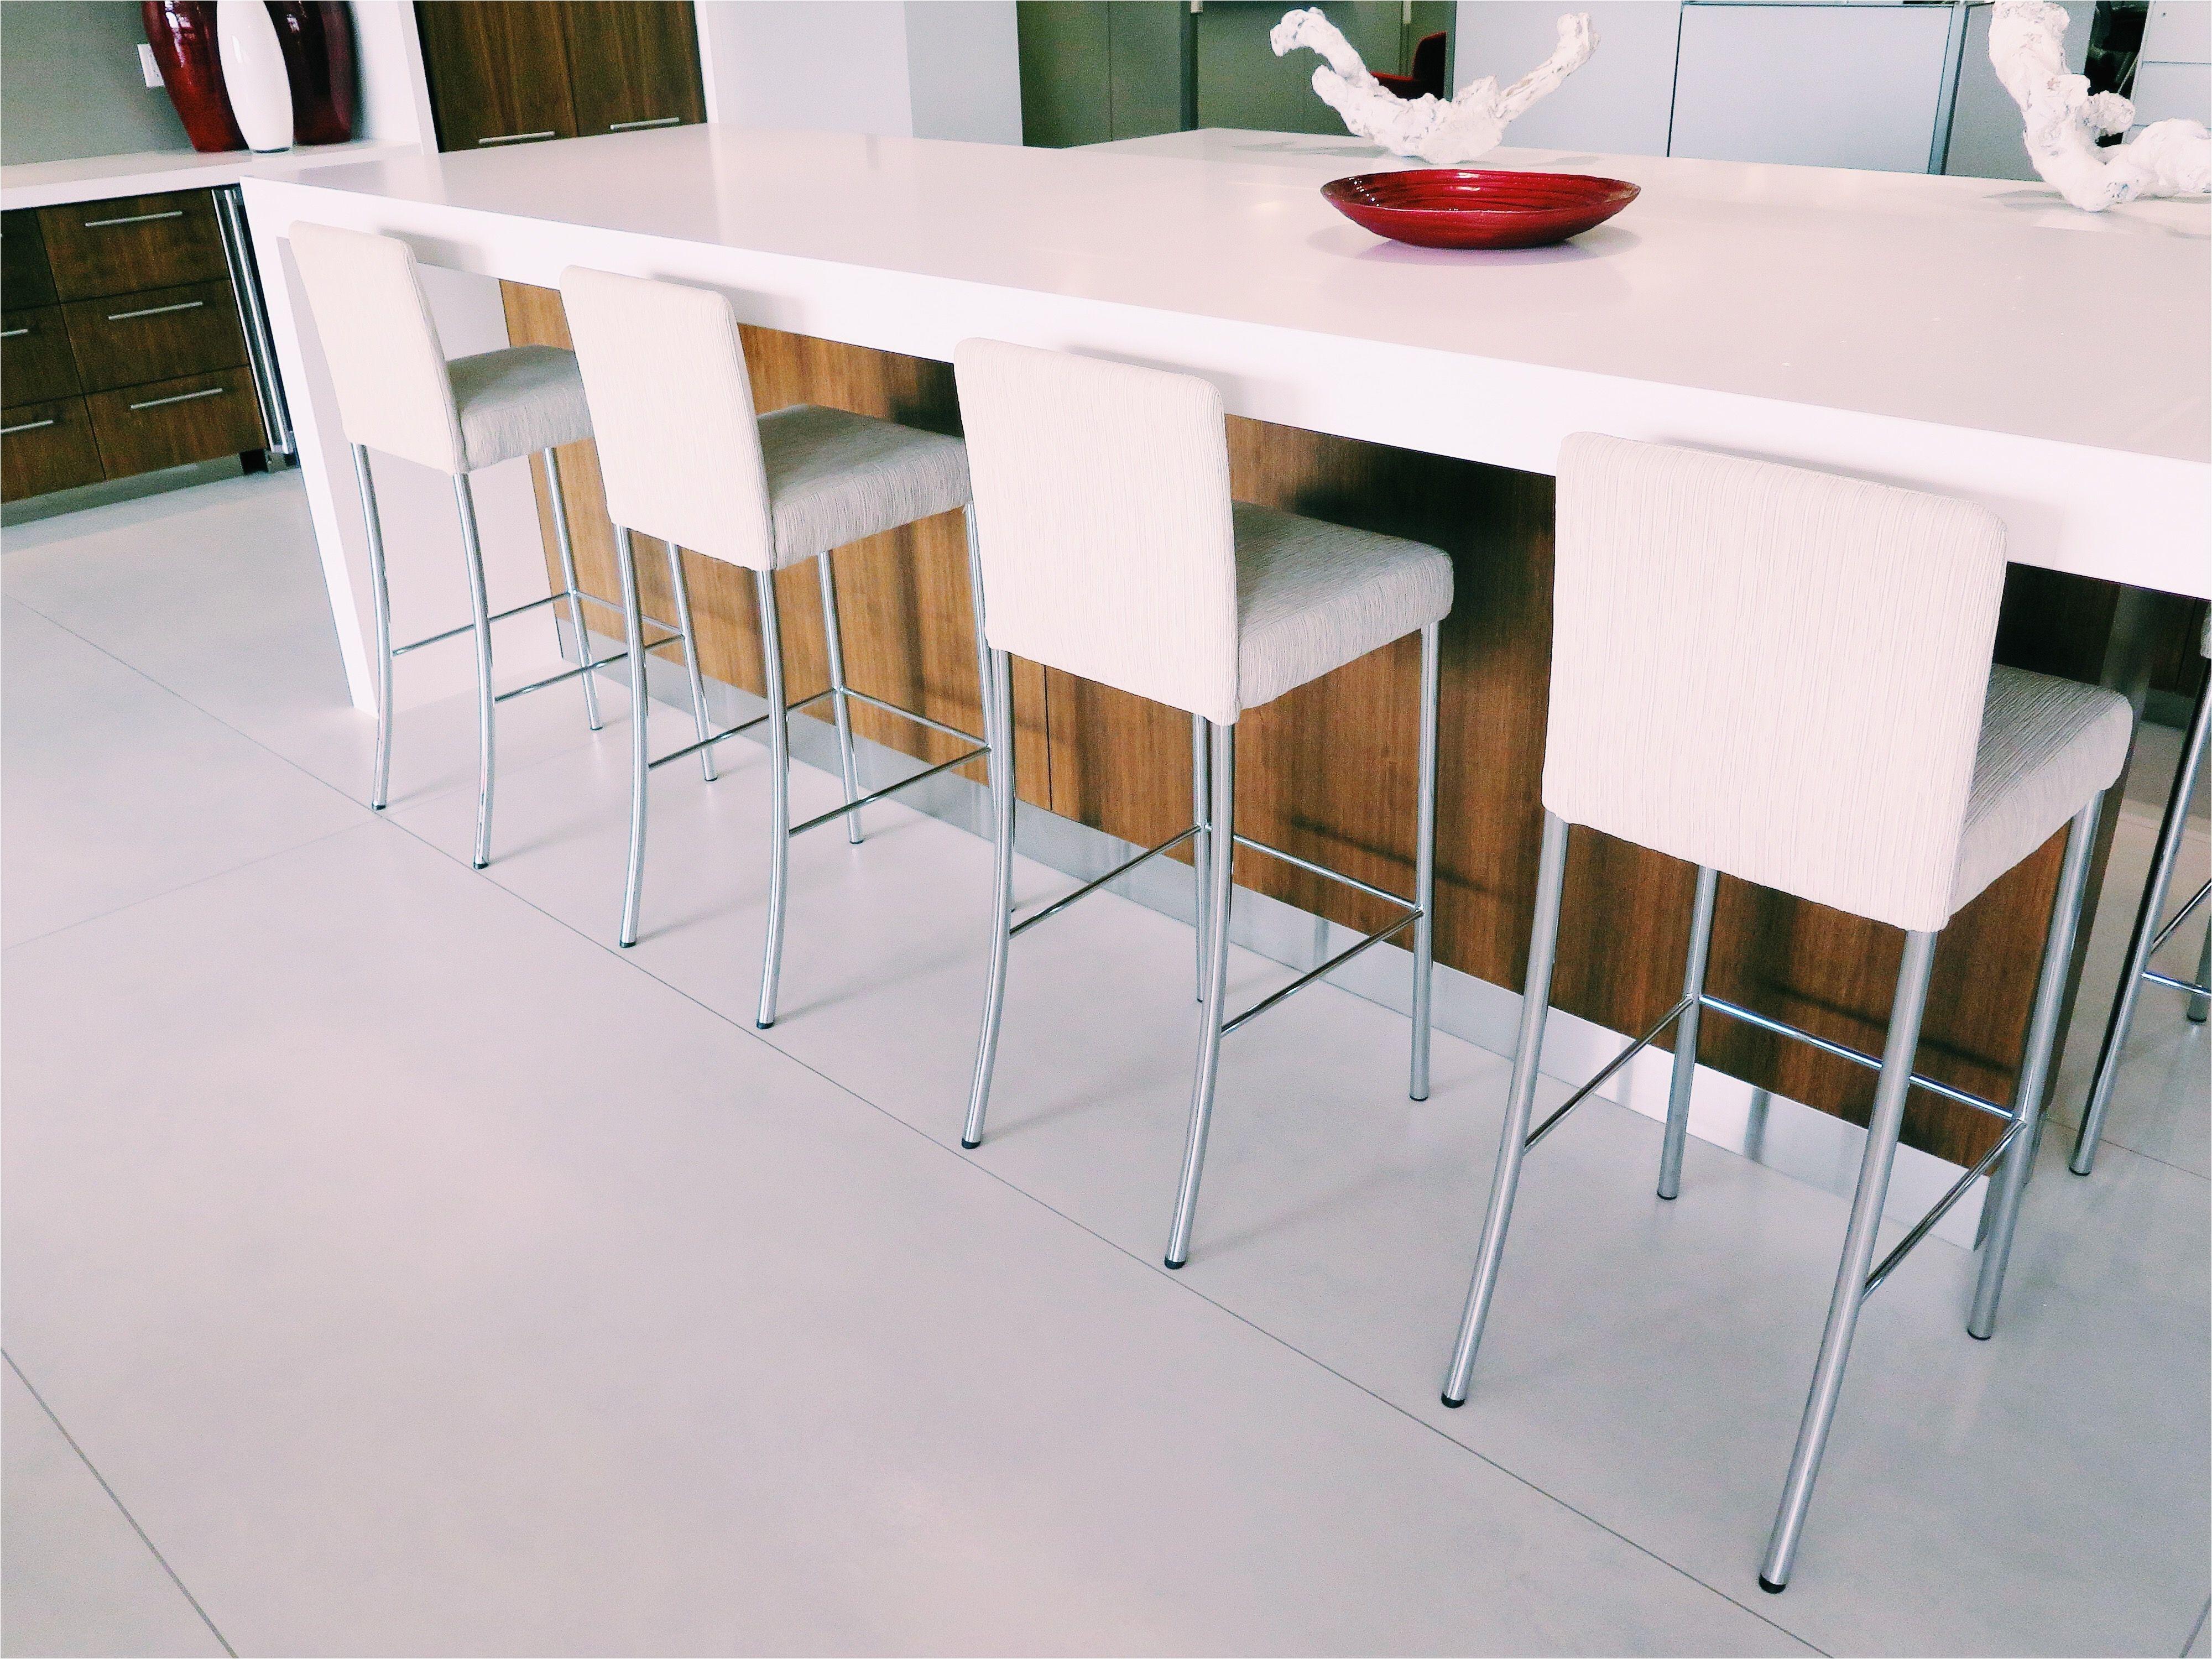 Coalesse Bob Chairs Coalesse Switch Stool A Modern yet Elegant Design Bringing New